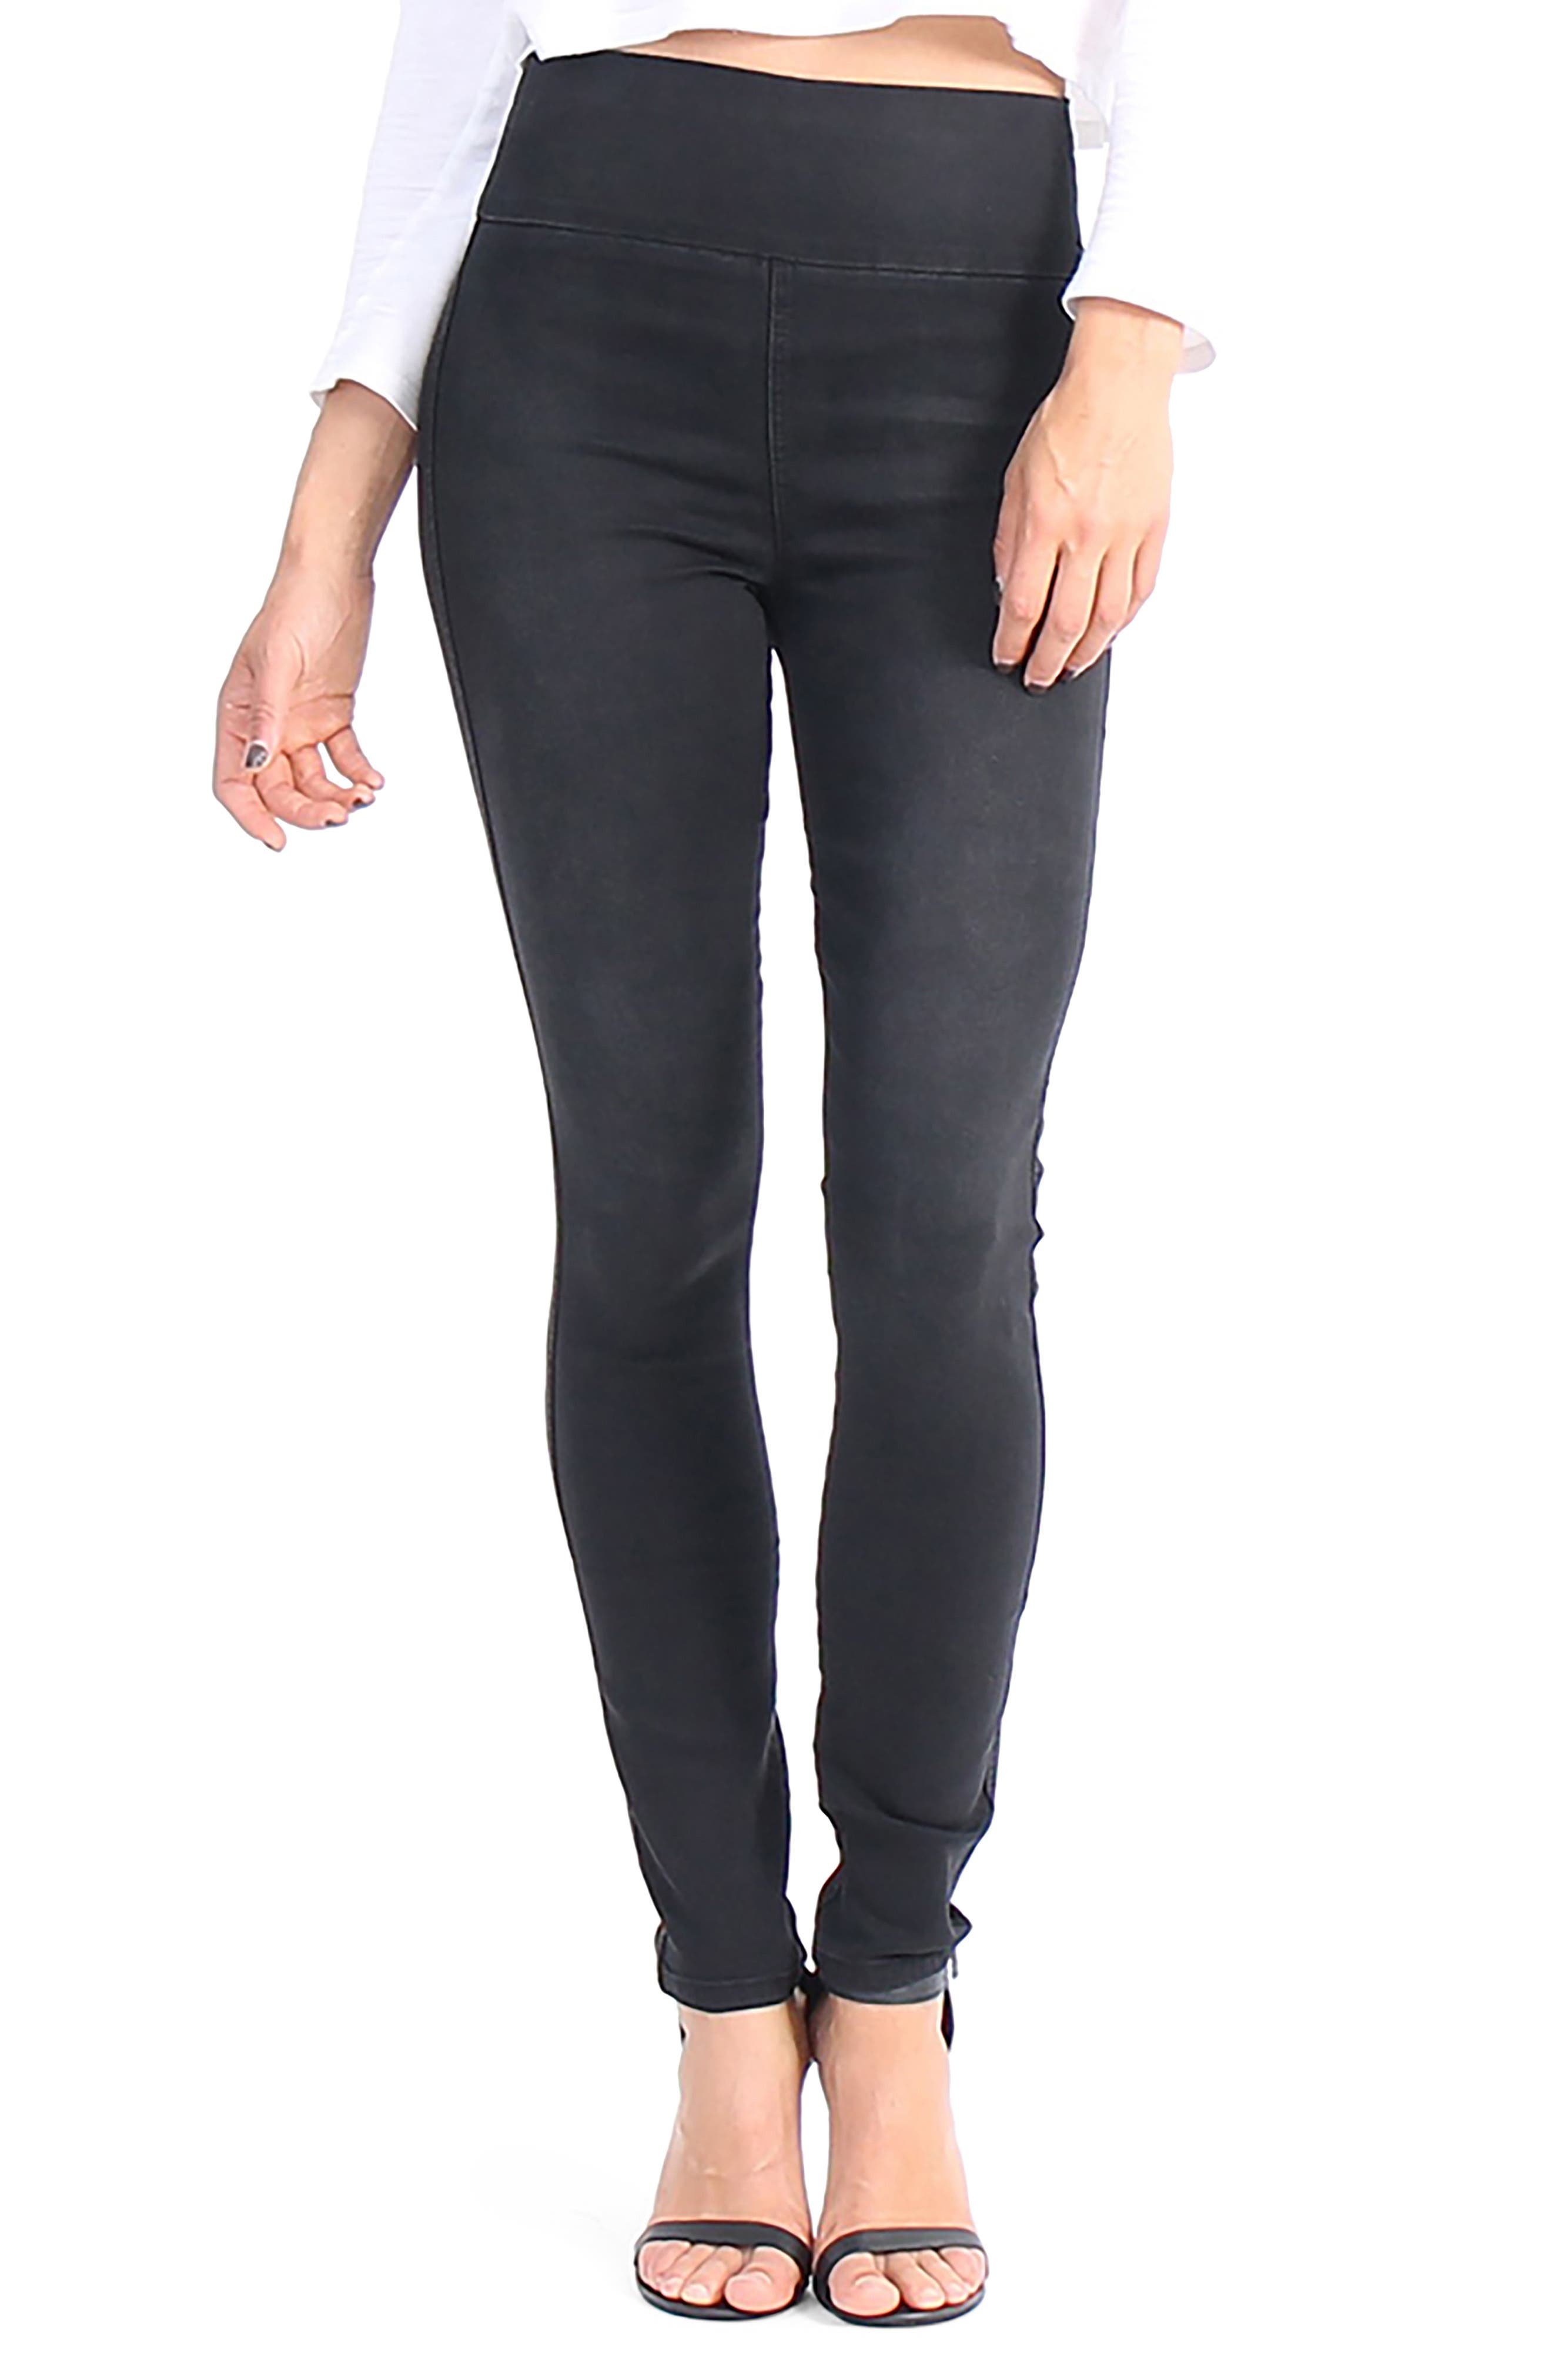 Devon Pull On Skinny Jeans,                             Main thumbnail 1, color,                             003